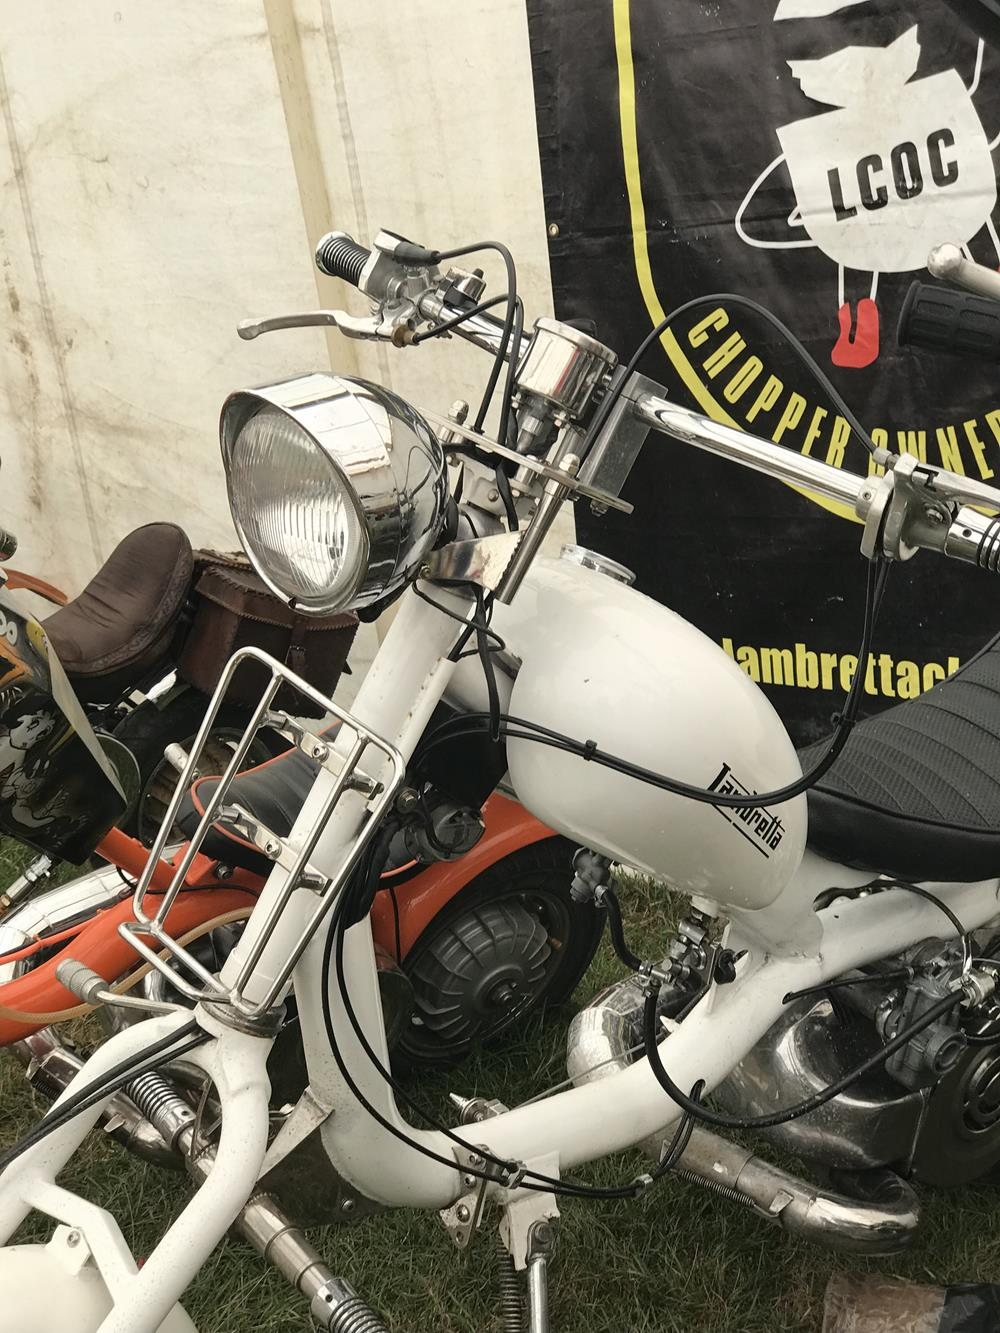 White Lambretta chopper